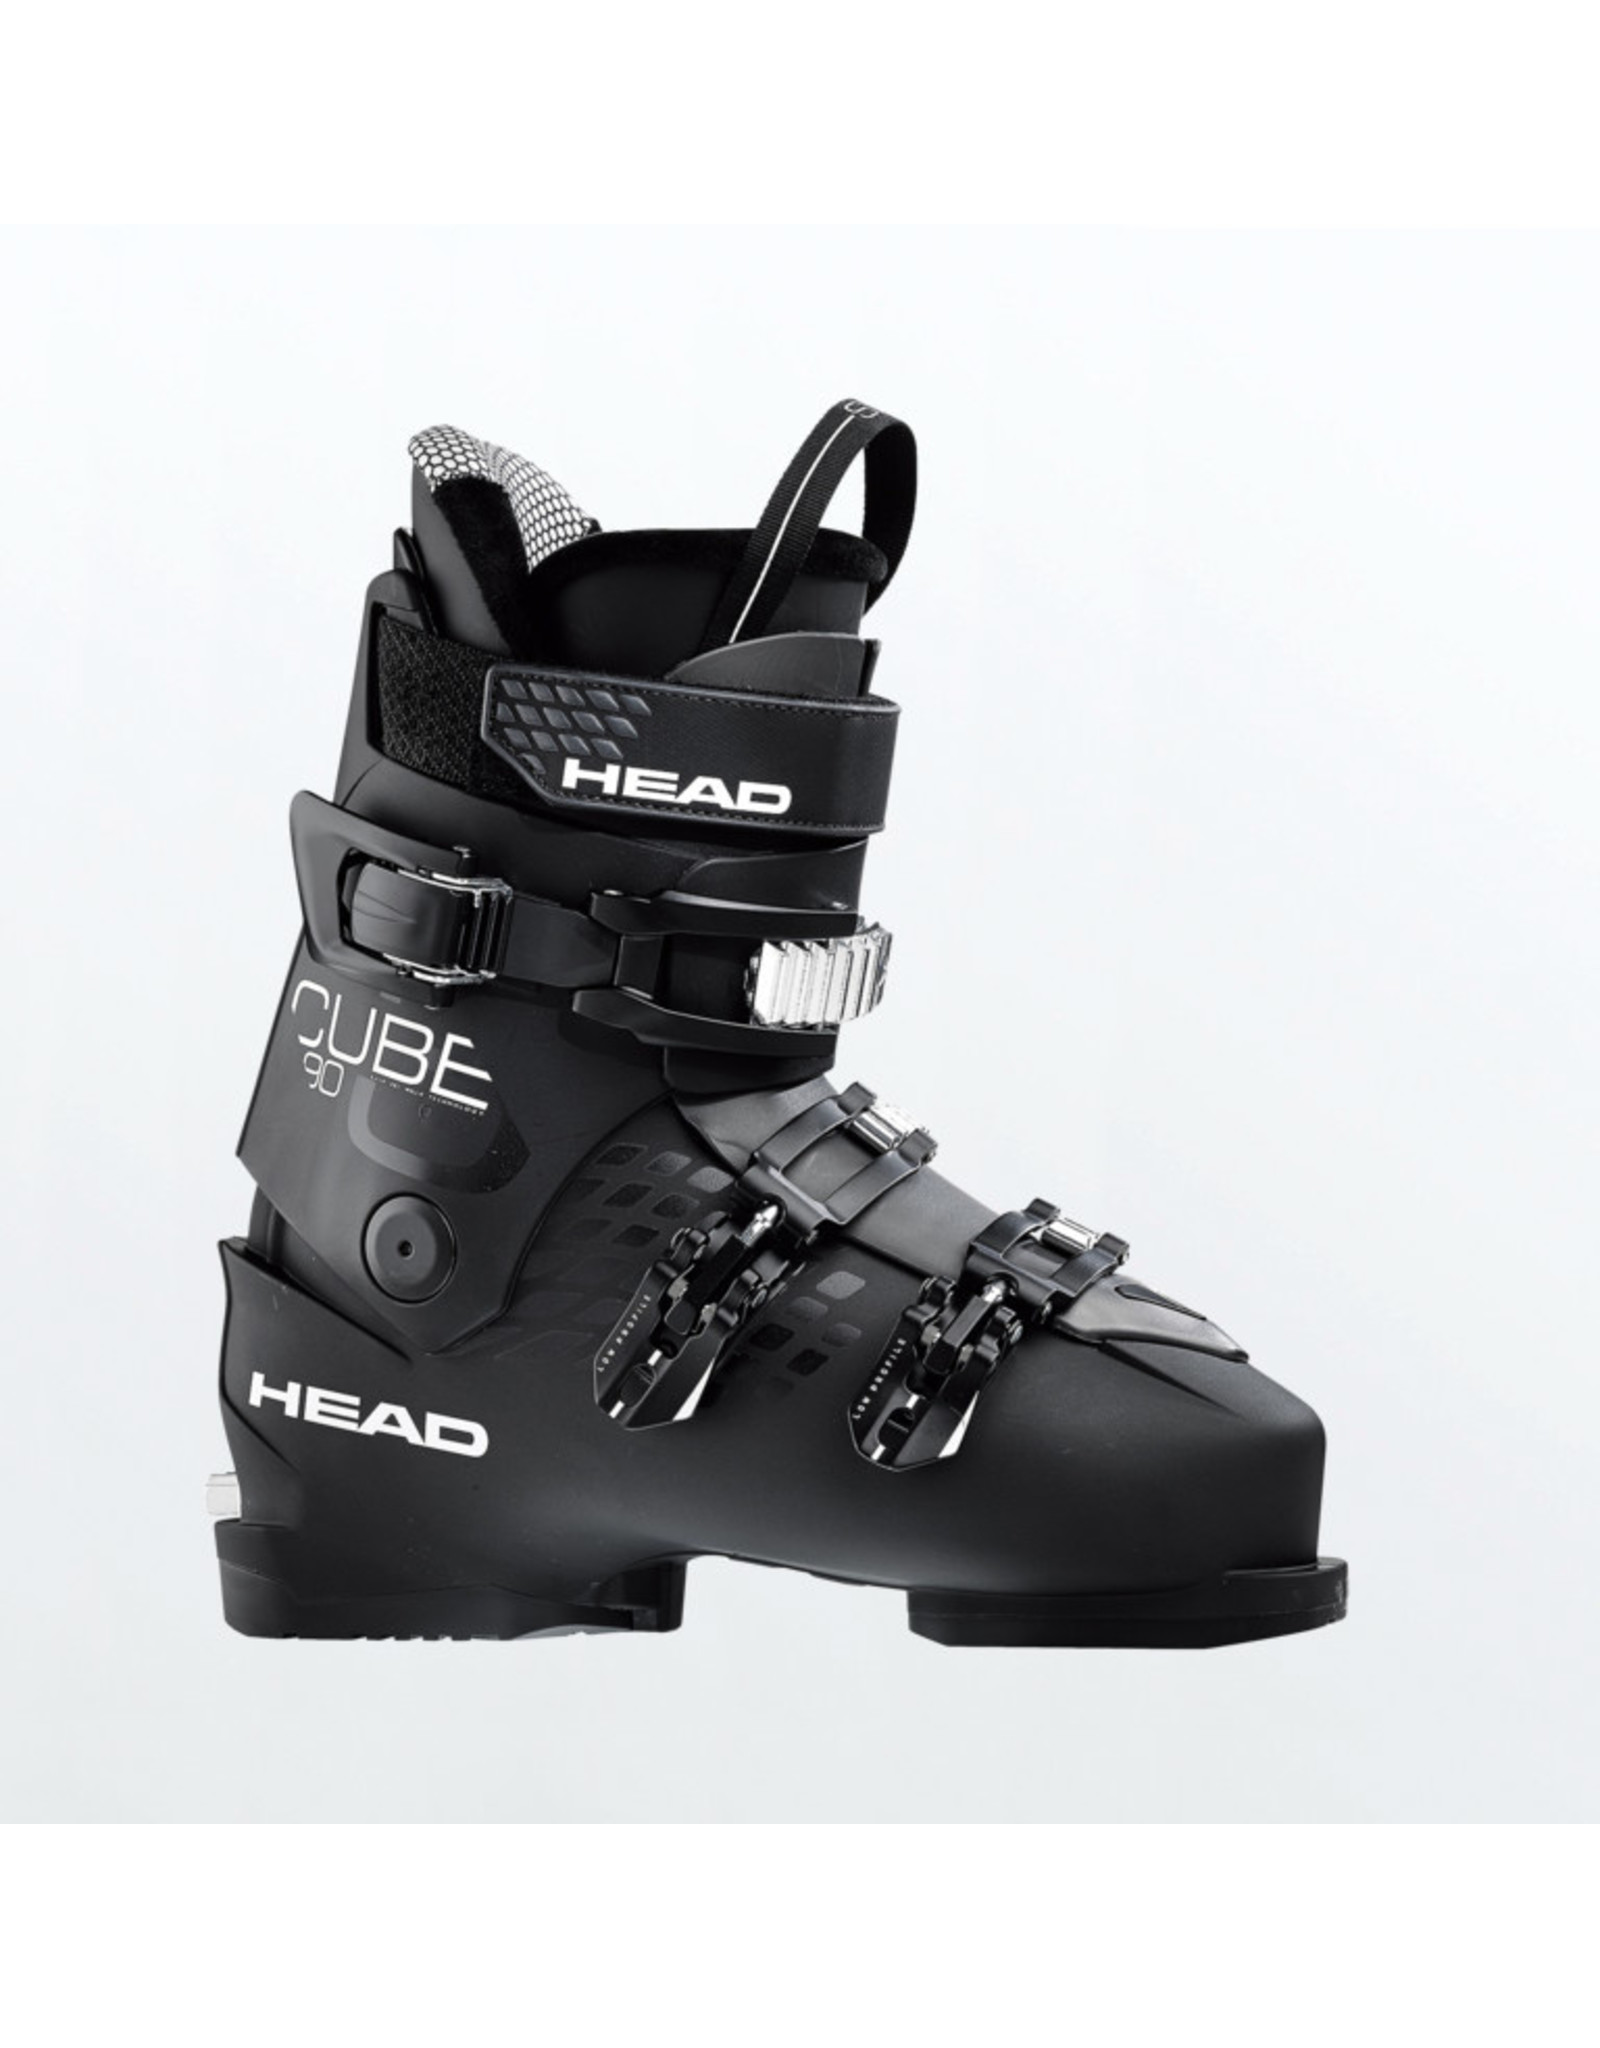 Head HEAD Cube 3 90 F20